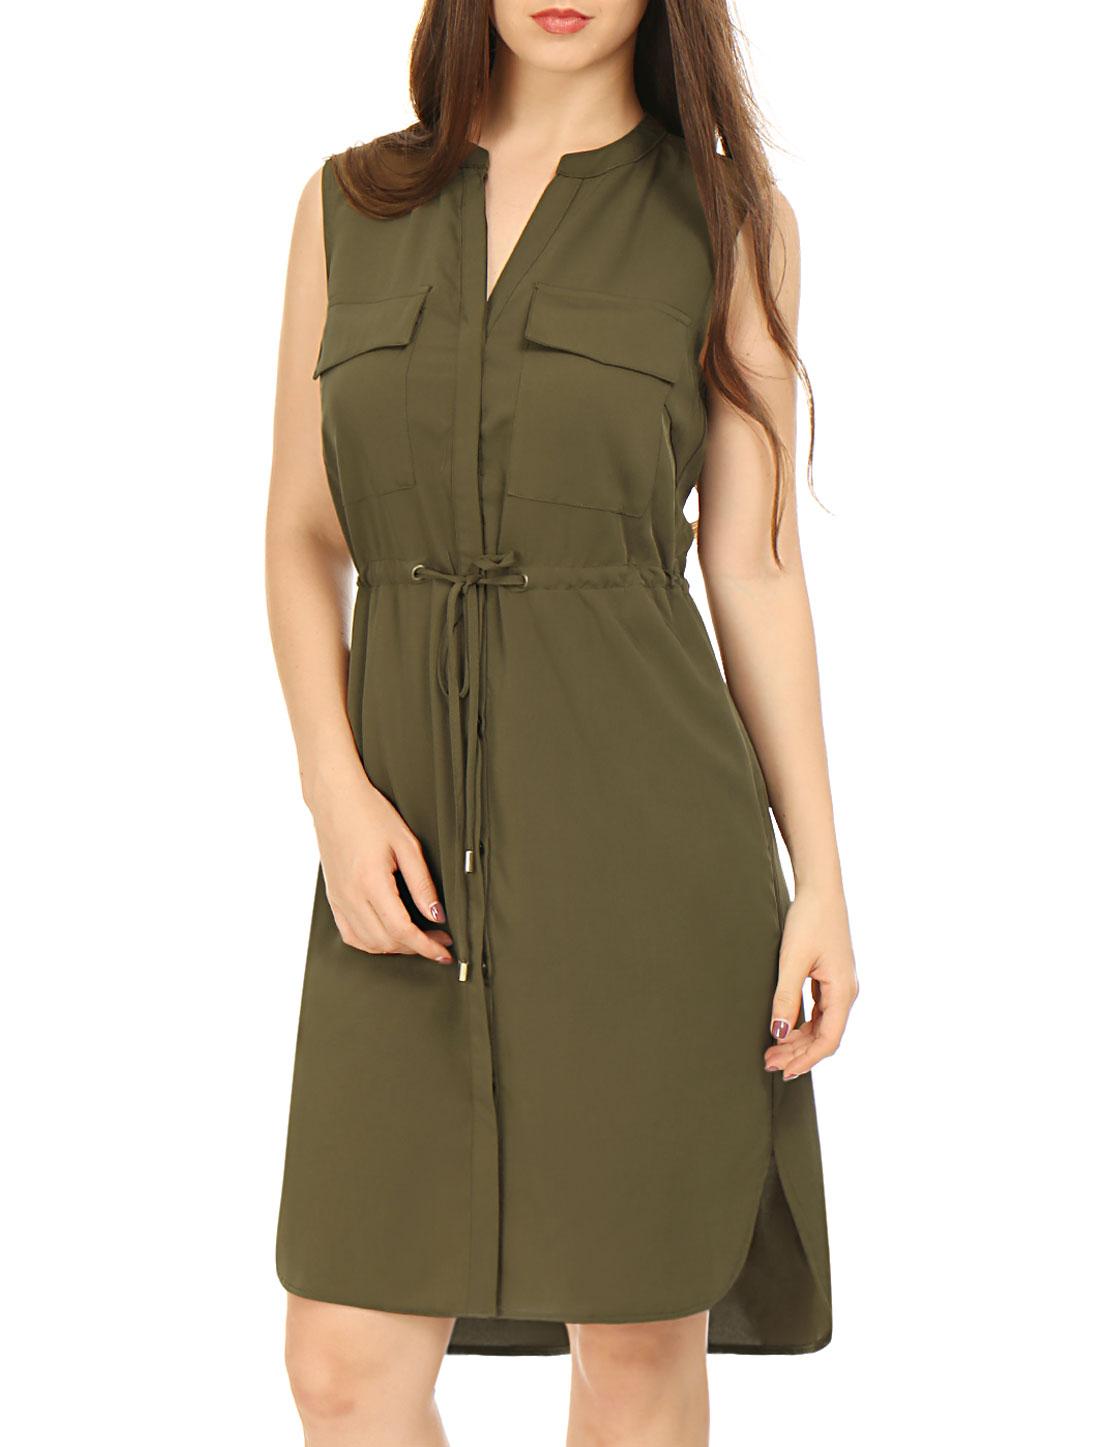 Allegra K Woman Single Breasted Drawstring Sleeveless Dress Green M